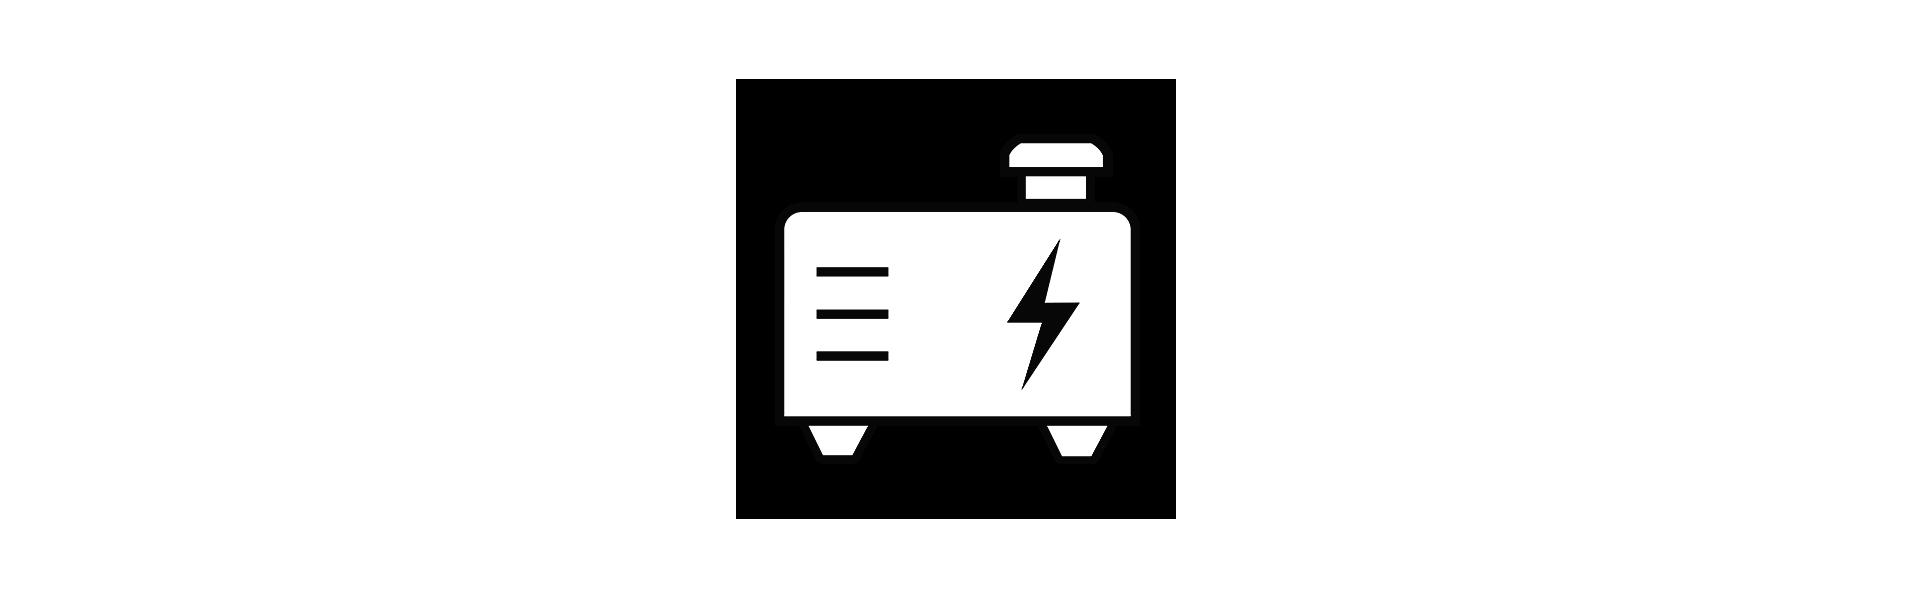 generator icon smaller